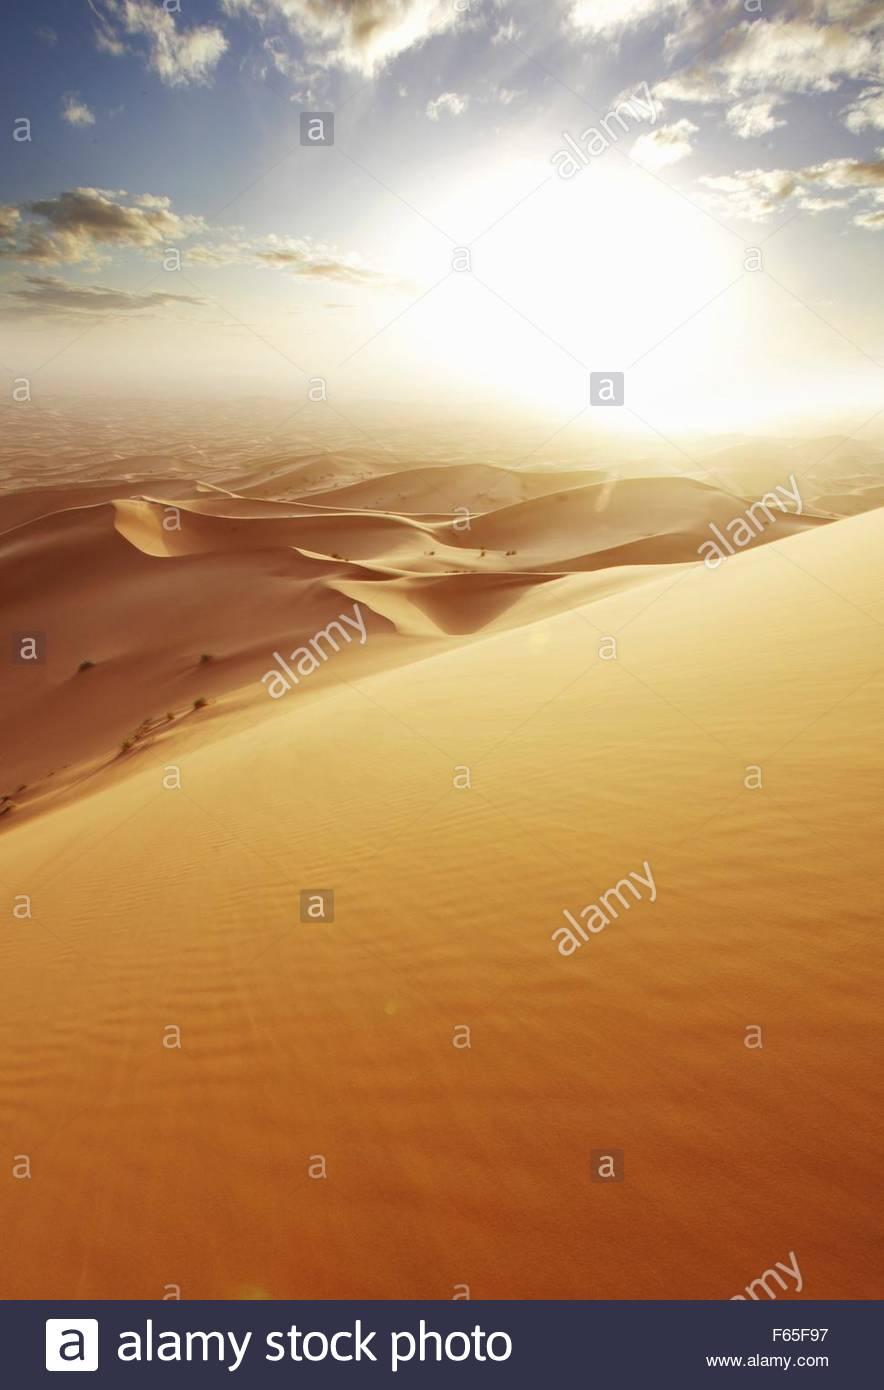 The sand dune desert Erg Chebbi, Morocco - Stock Image